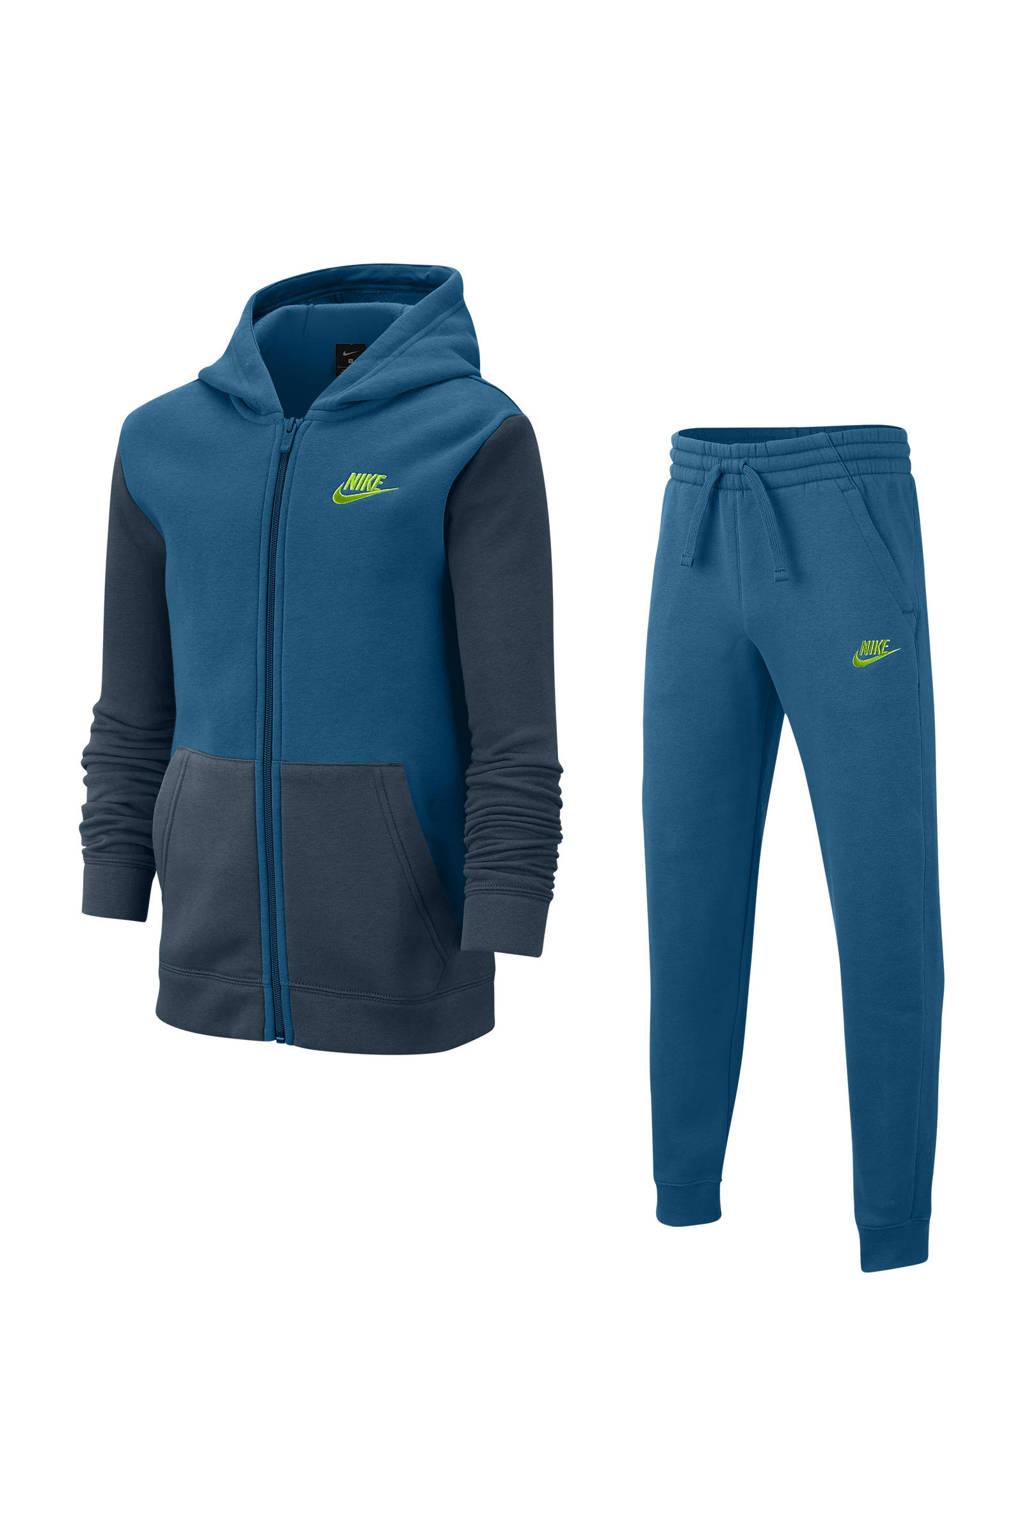 Nike   trainingspak donkerblauw, Petrol/donkerblauw/geel